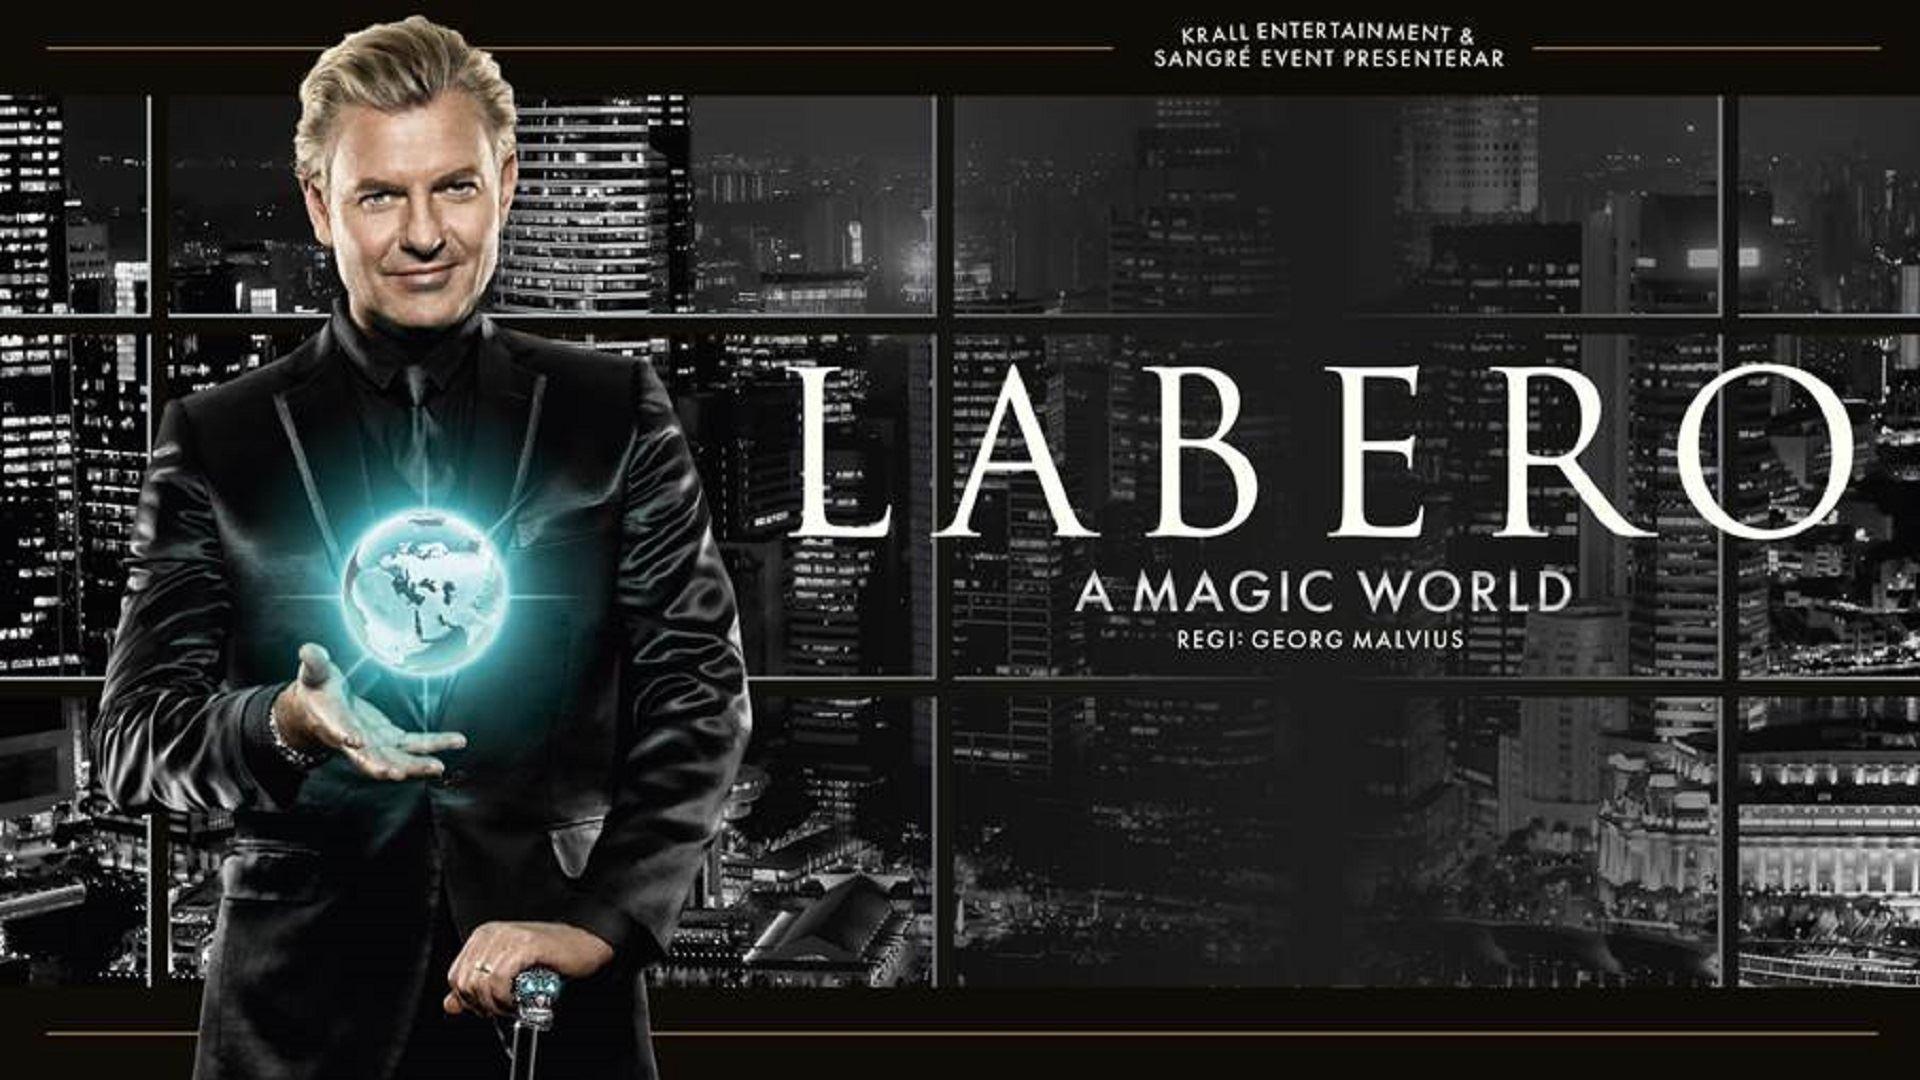 Joe Labero- A magic world